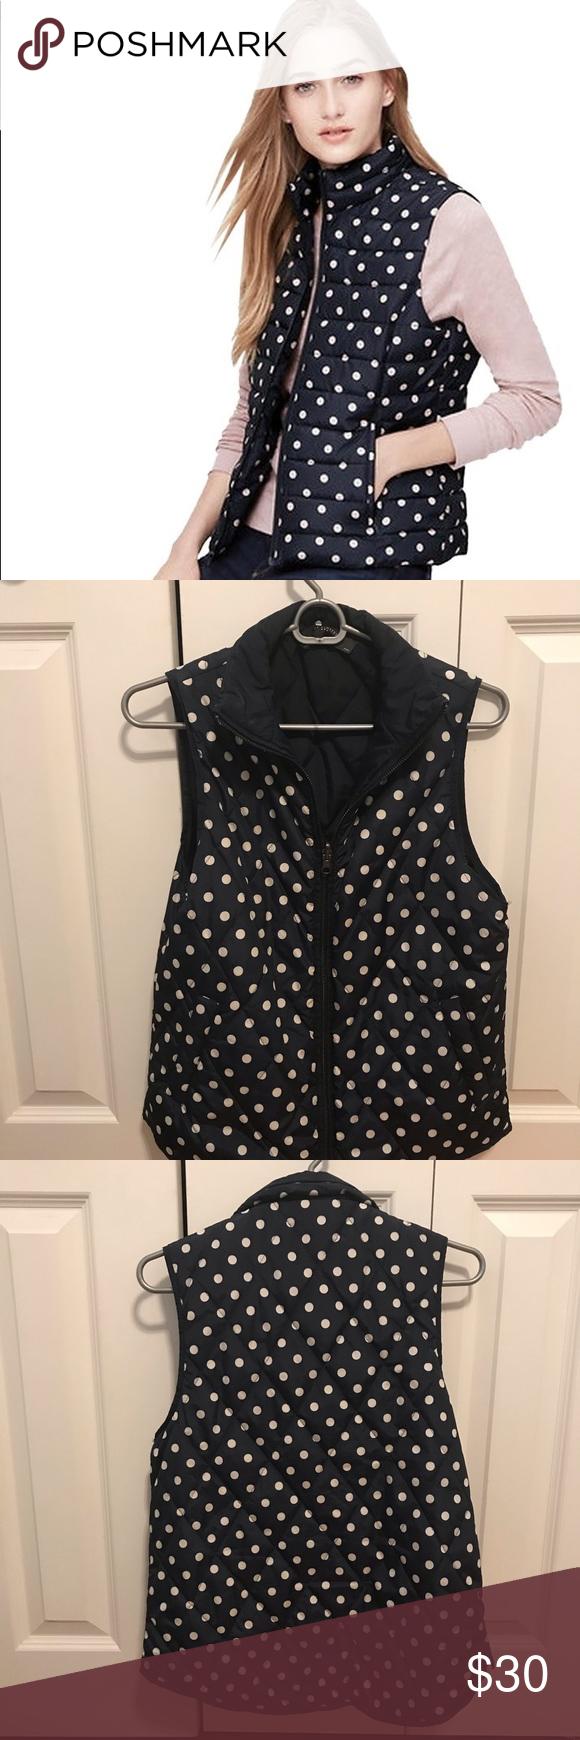 Loft Navy Polka Dot Vest Cute lightweight vest, size small.  Only worn a handful of times— great condition. LOFT Jackets & Coats Vests #myposhpicks